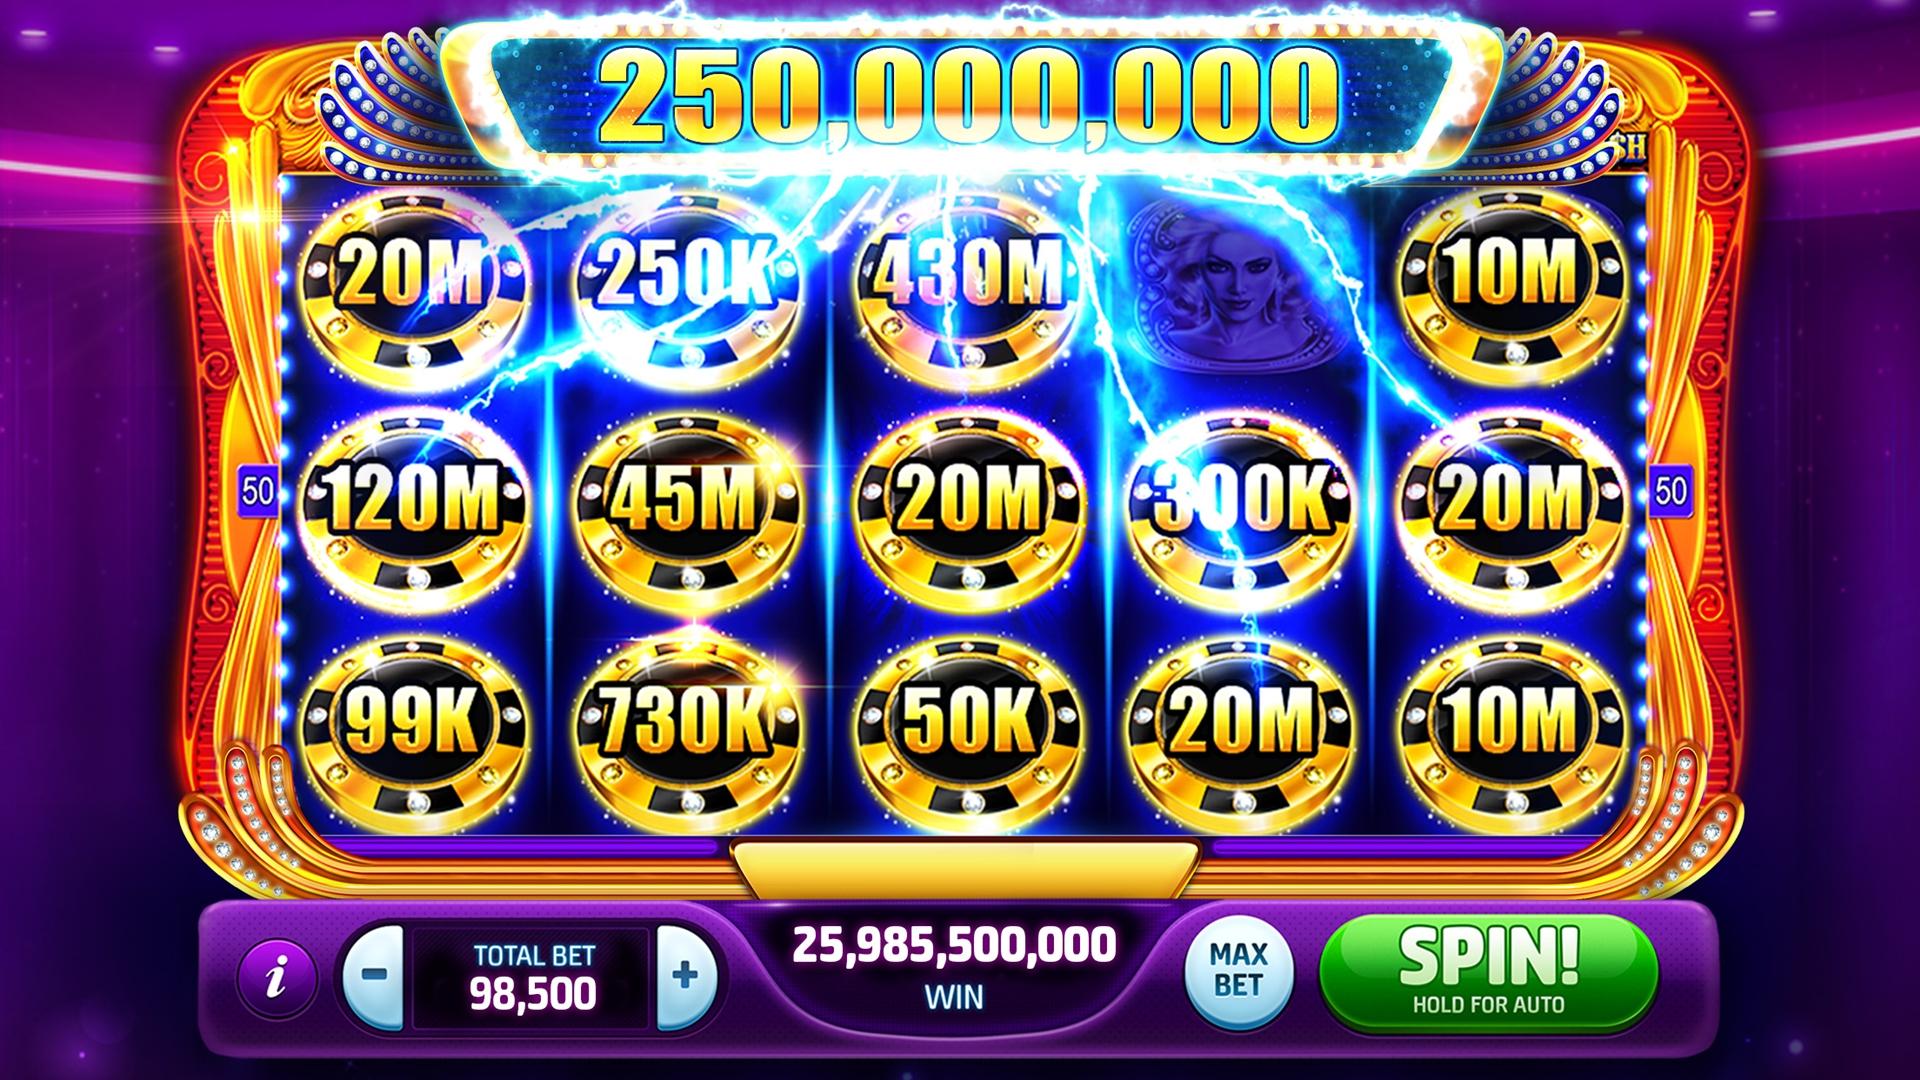 Big spins casino